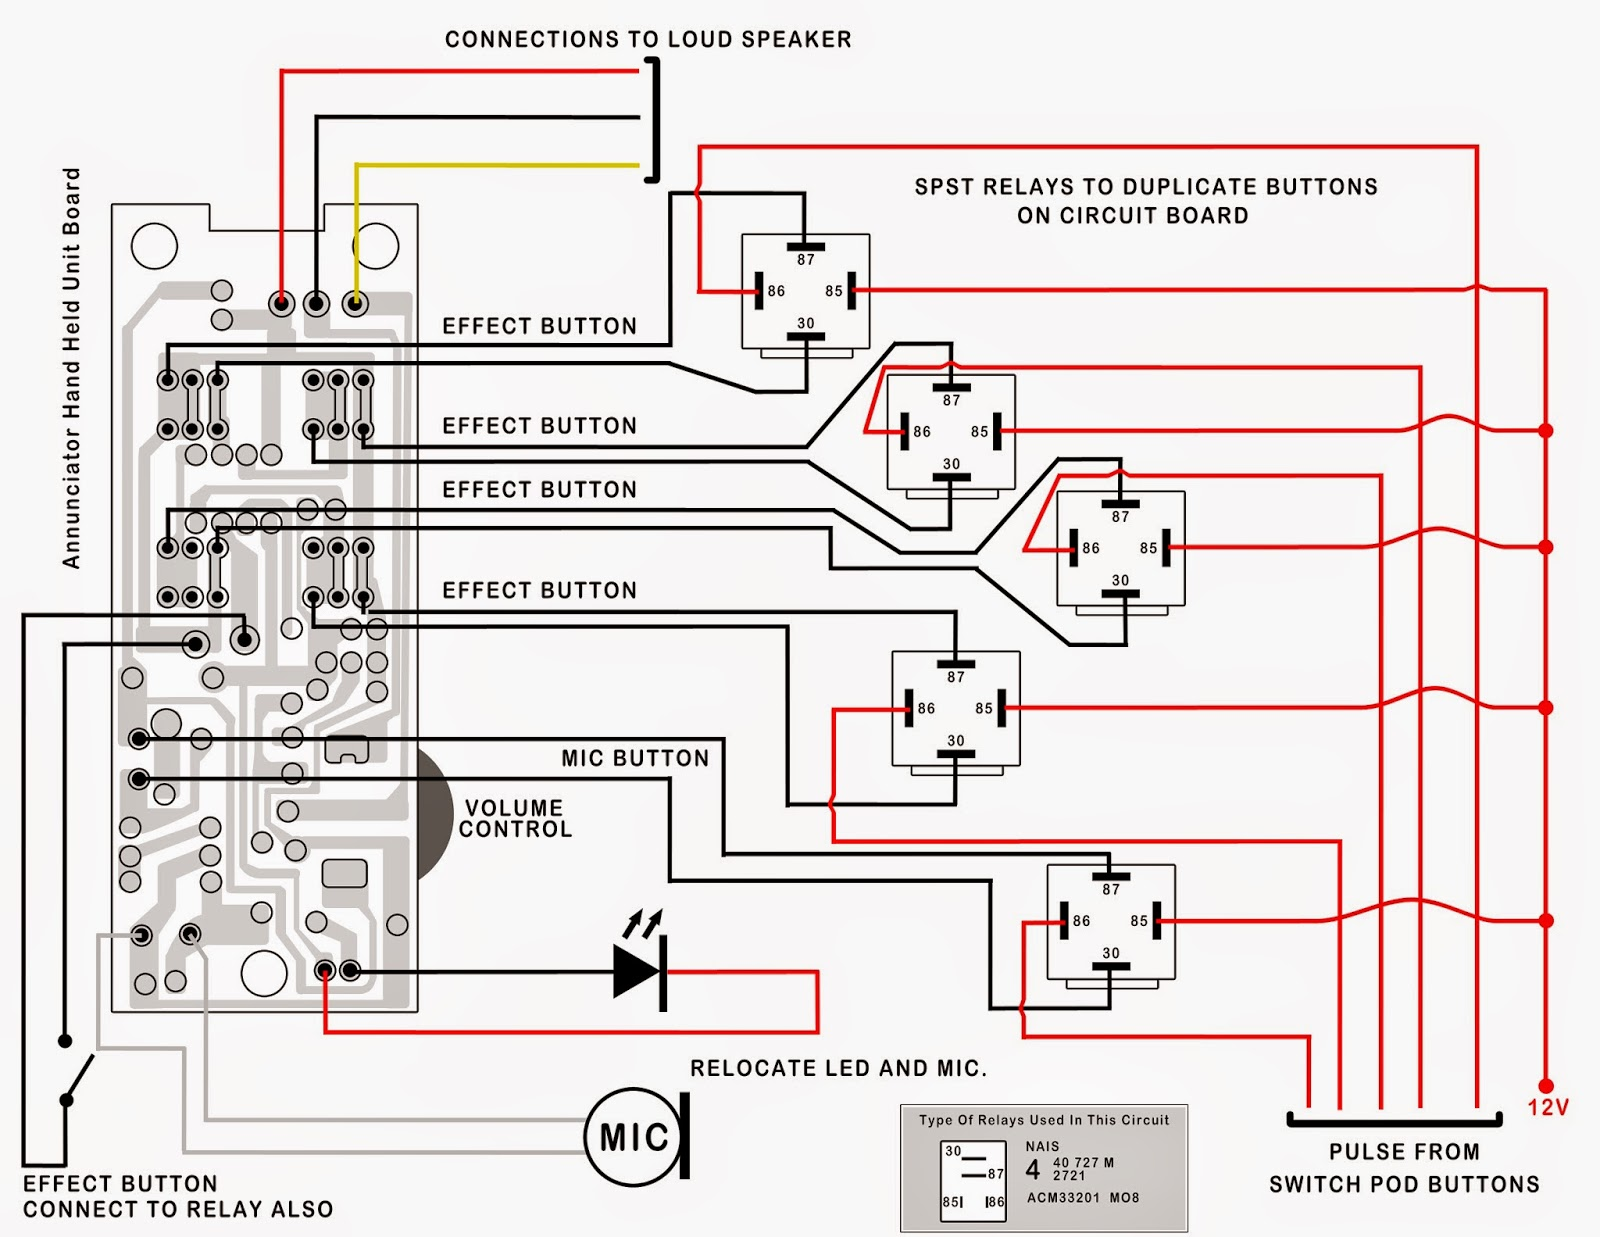 medium resolution of 4l60e sd sensor wiring diagram neutral safety switch 4l60e plug diagram 1999 silver 4l60e plug diagram 1999 silver